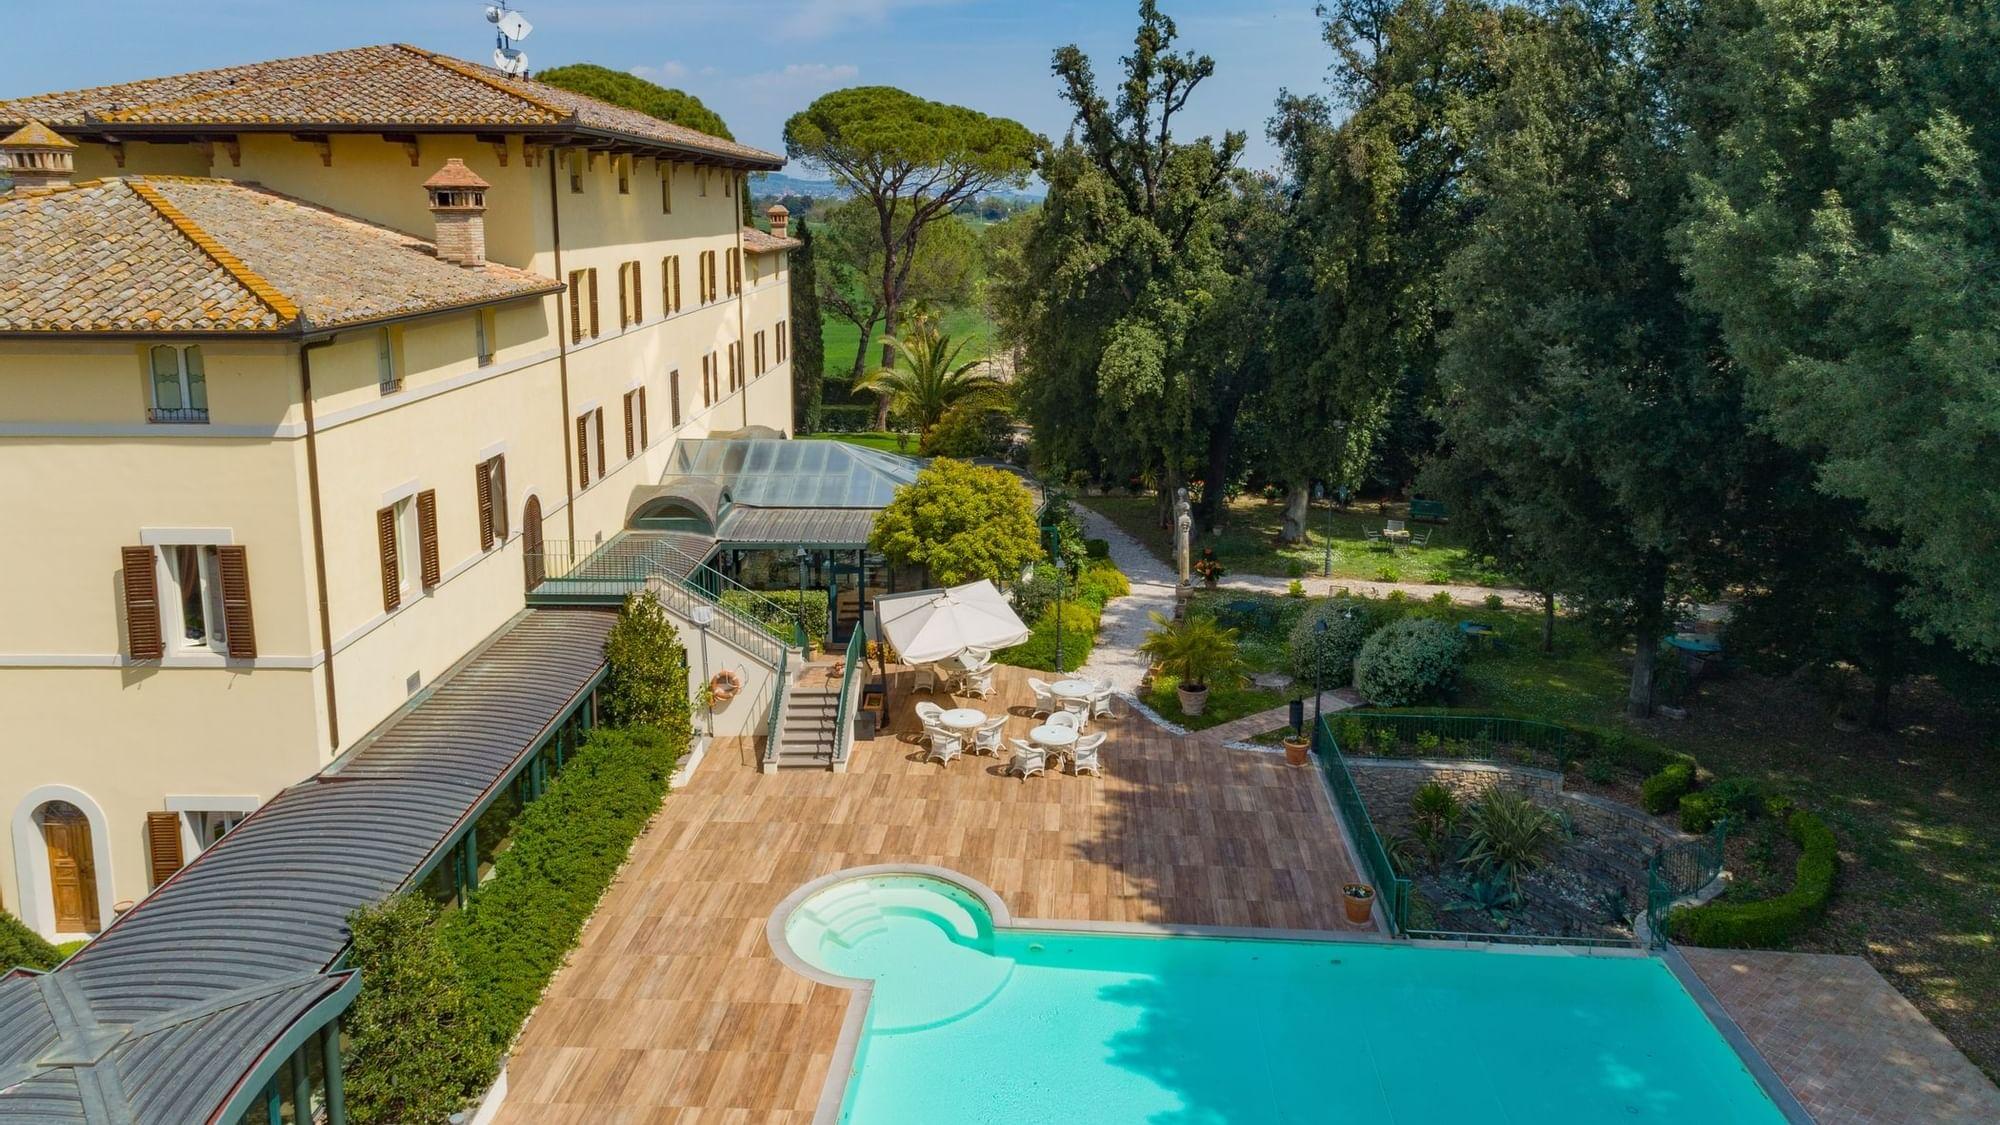 Villa storica con piscina a Perugia, in Umbria